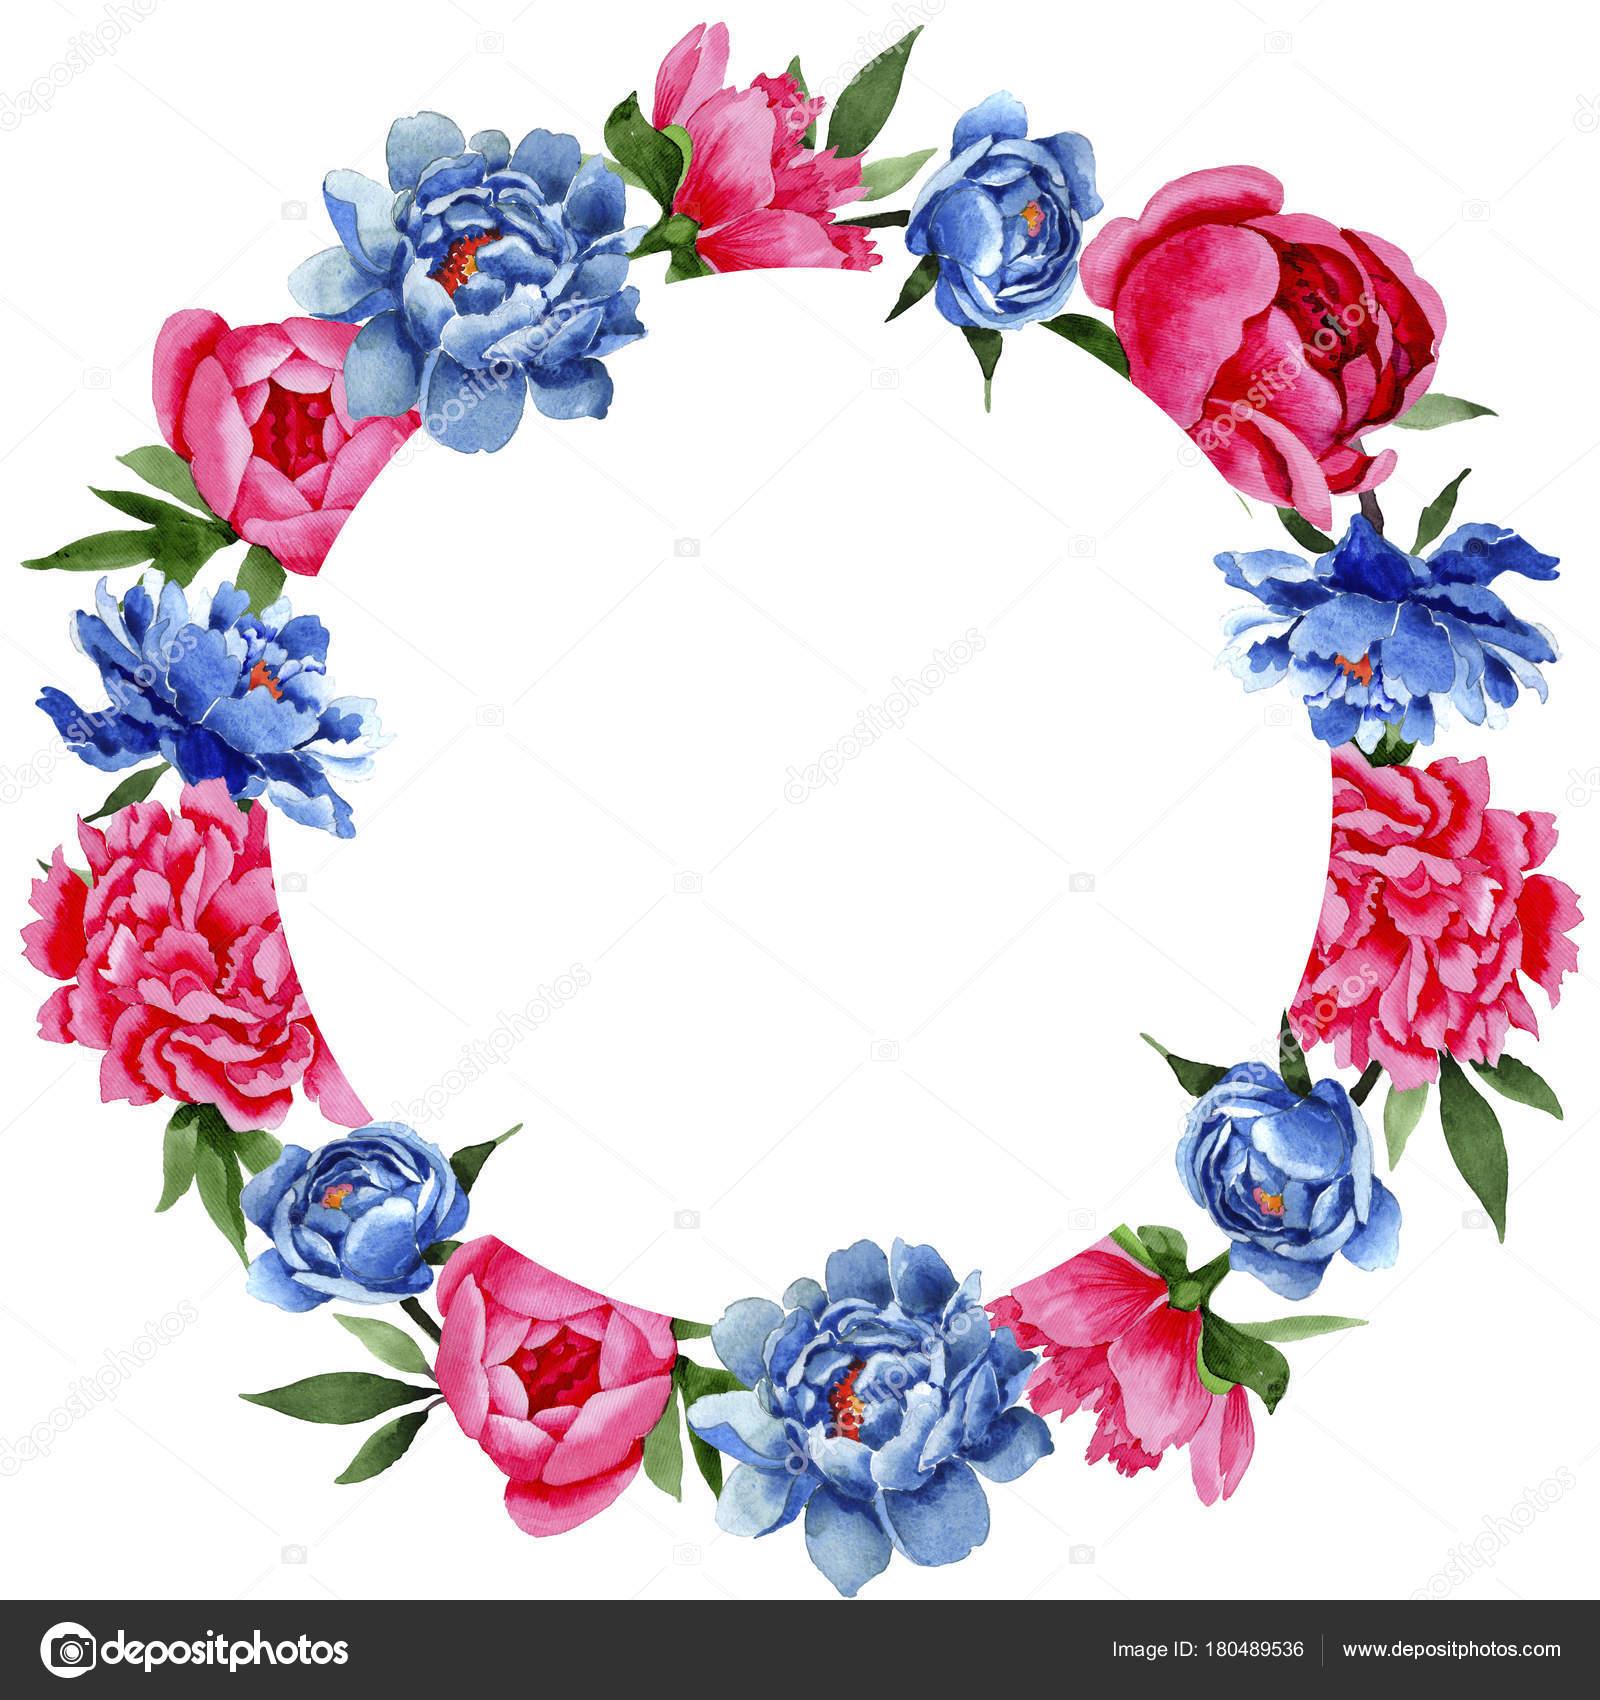 Wildflower red and blue peonies flowers wreath in a watercolor style wildflower red and blue peonies flowers wreath in a watercolor style stock photo izmirmasajfo